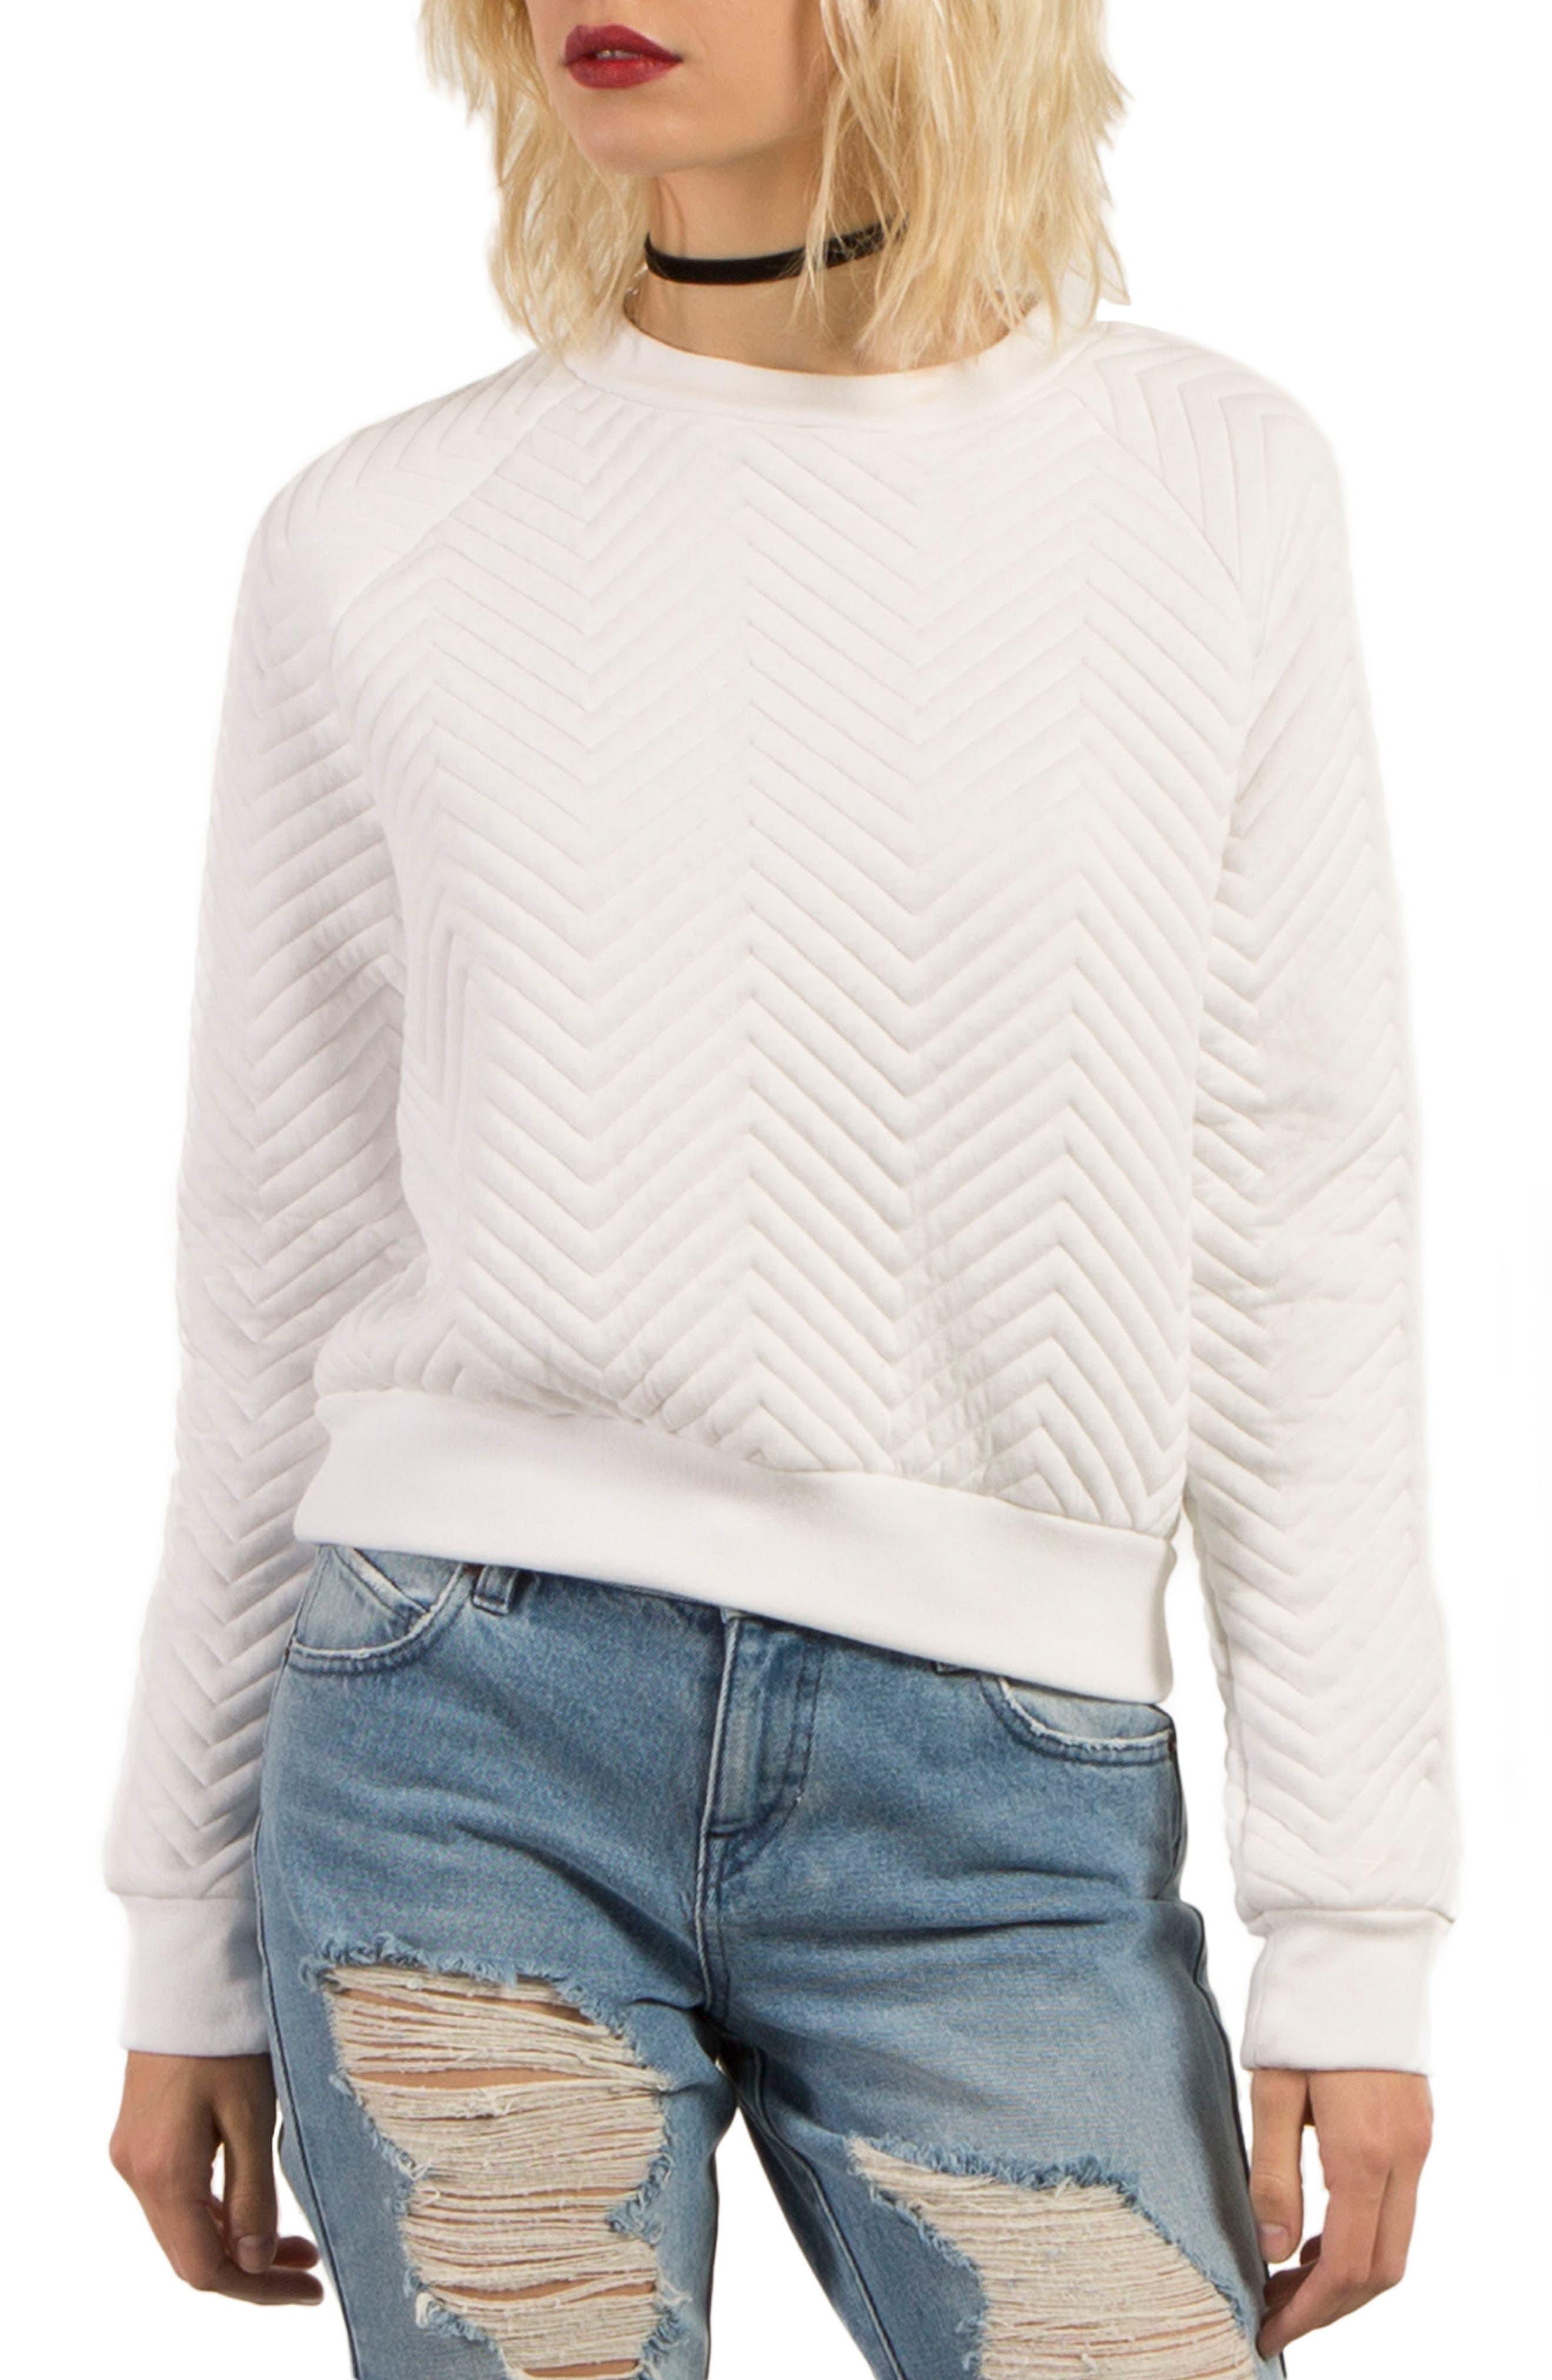 Cozy Dayz Sweatshirt,                         Main,                         color, White